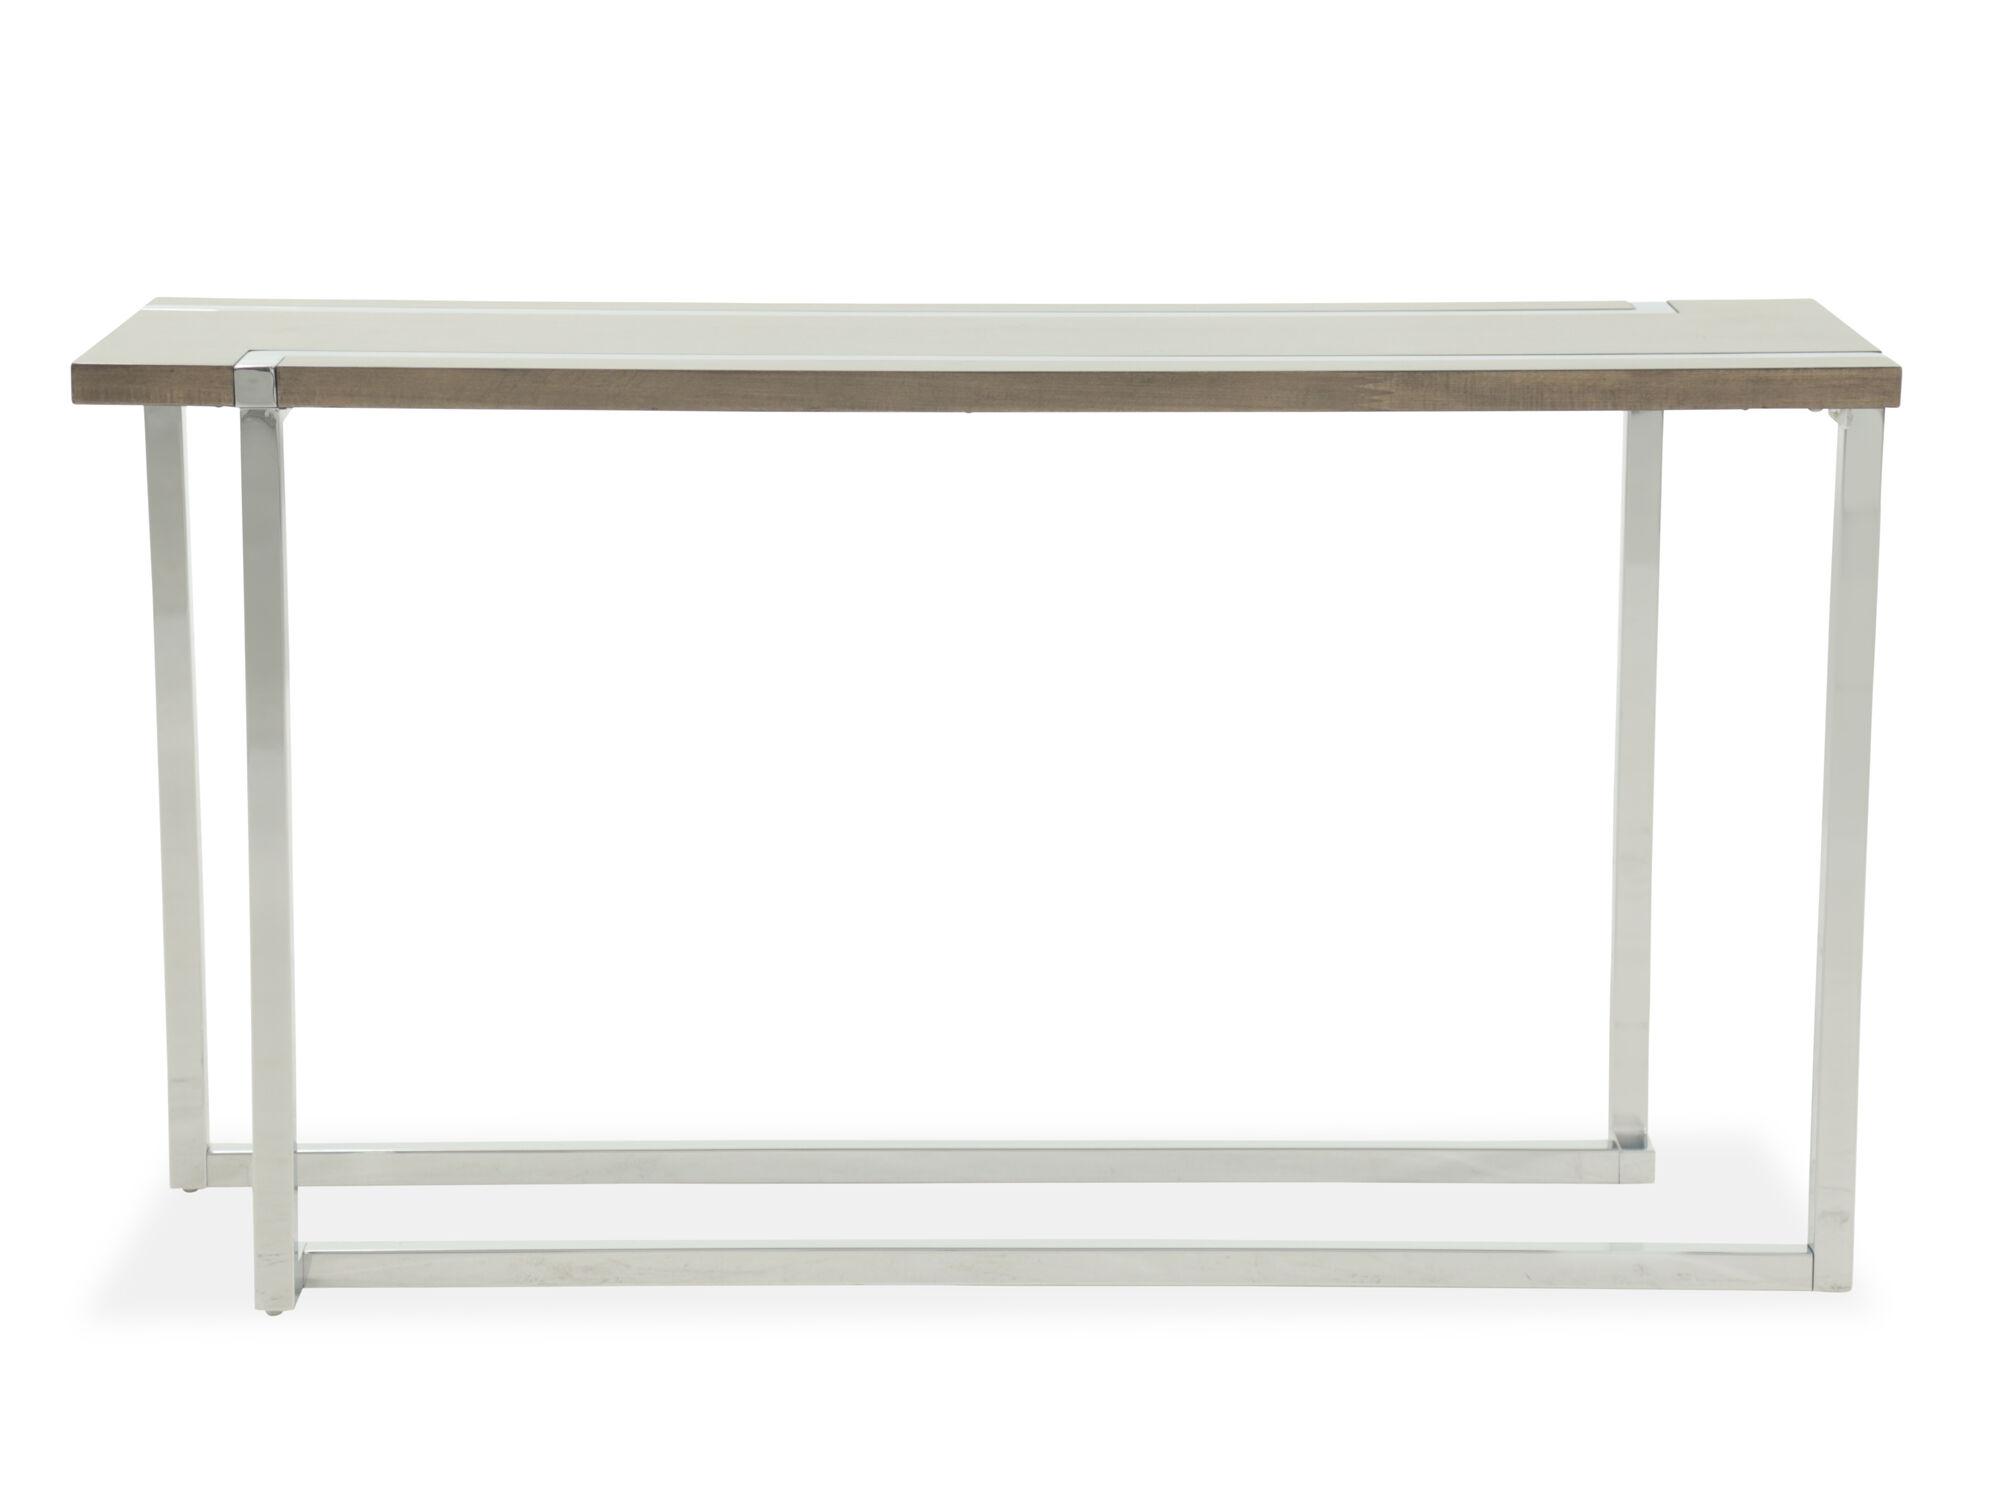 vogue chrome sofa table repair hyderabad kukatpally magnussen home kieran charcoal and